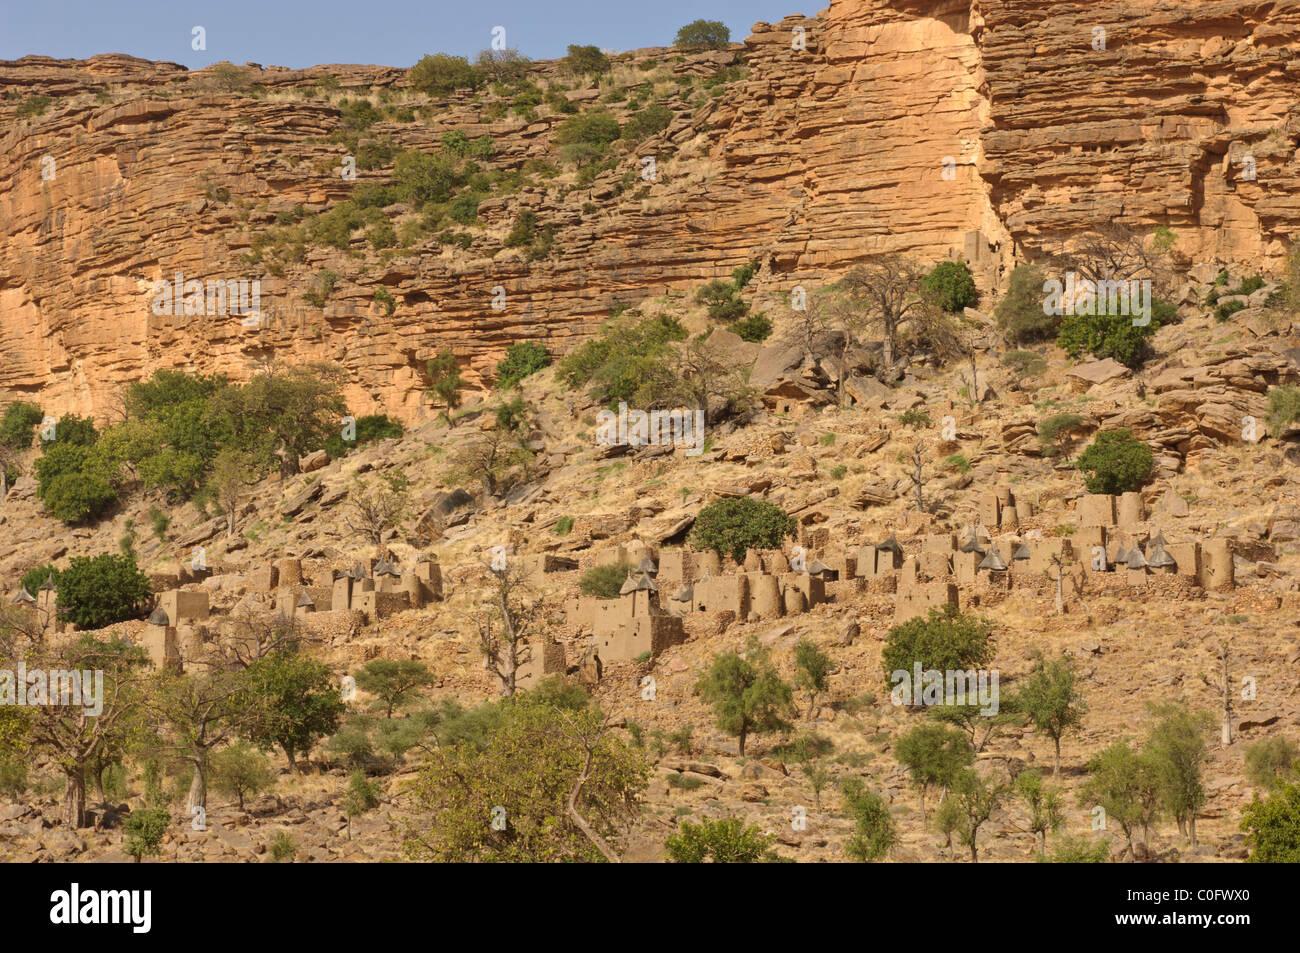 Dogon village of Neni built under the cliffs of  Bandiagara Escarpment. Pays Dogon, Mali - Stock Image